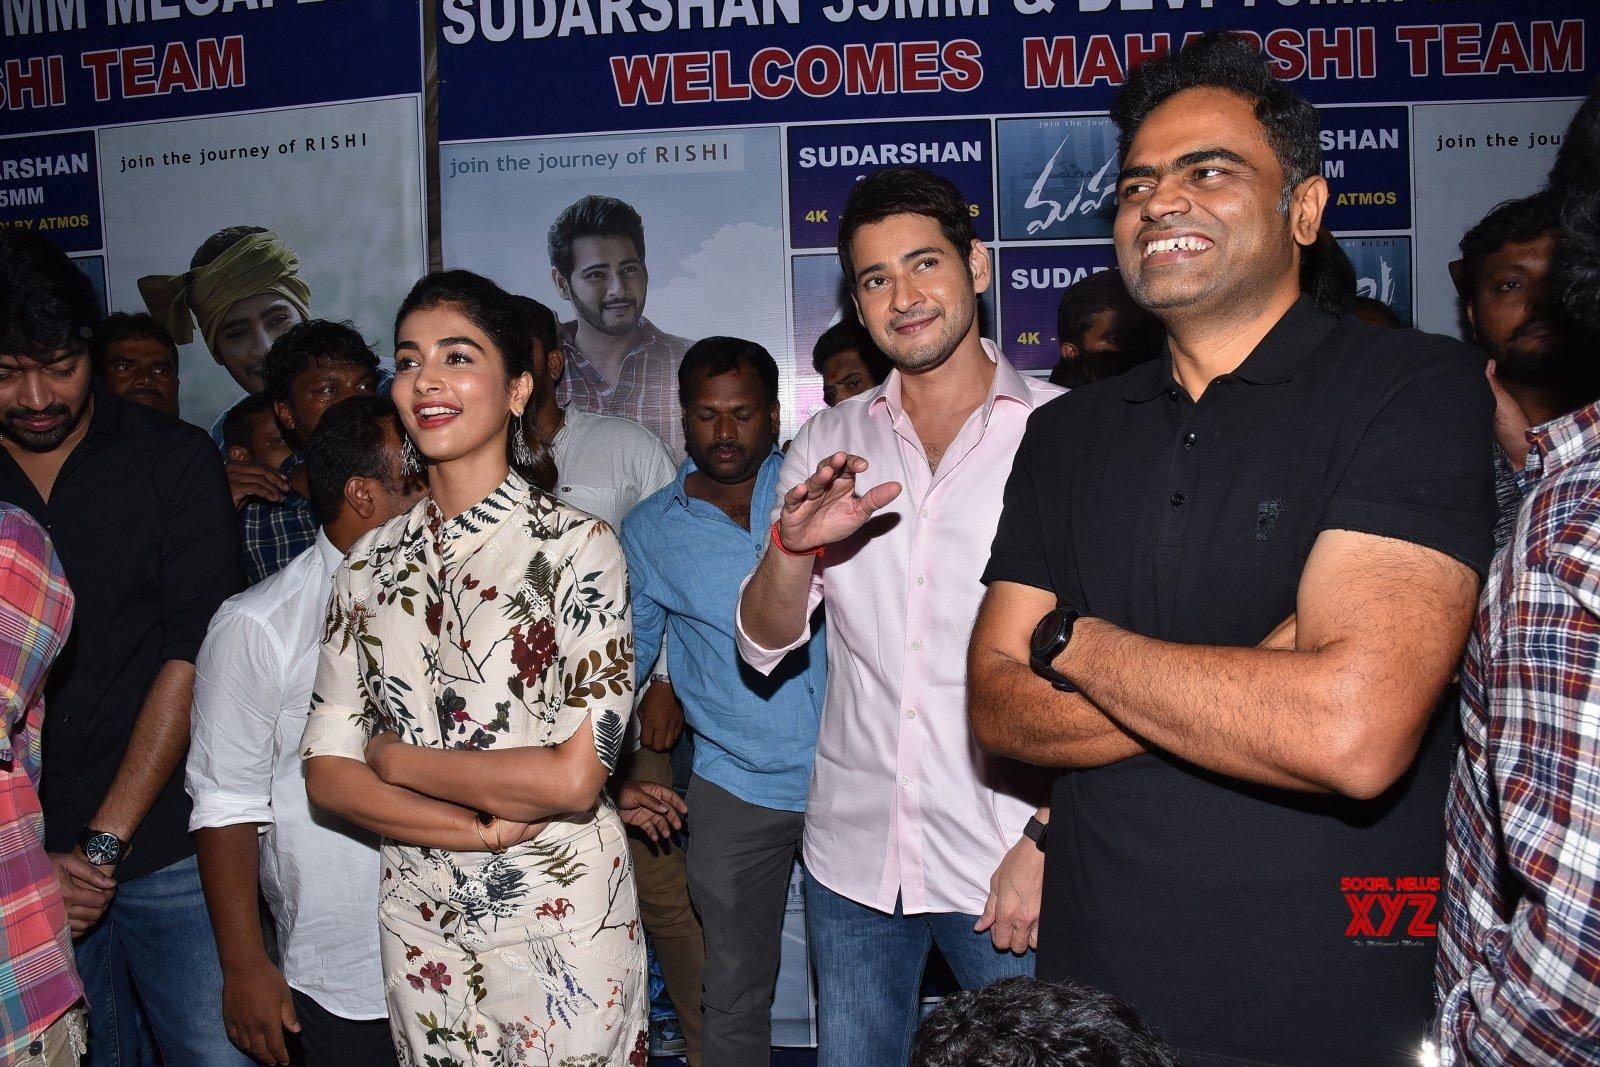 Mahesh Babu Visits To Sudarshan 35 MM With Maharshi Movie Team Gallery Set 1